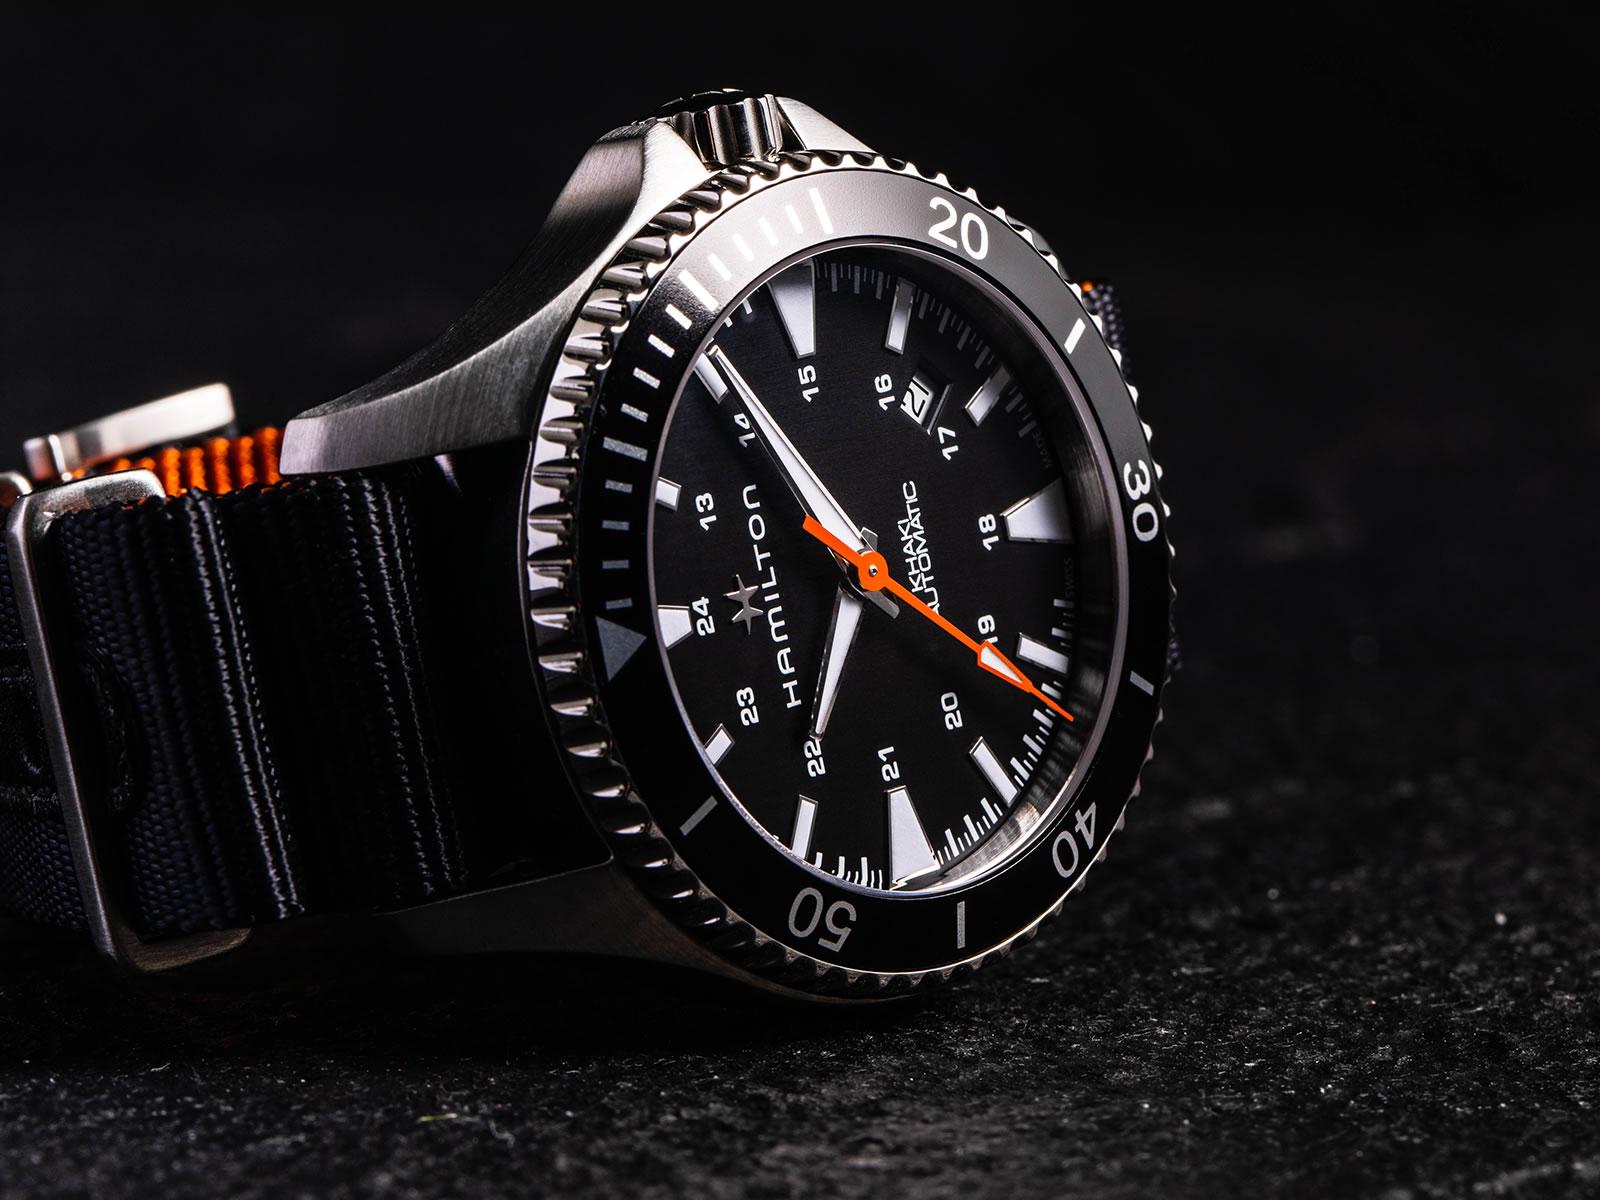 h82335031-hamilton-khaki-navy-scuba-auto-gear-patrol-special-edition-3-.jpg